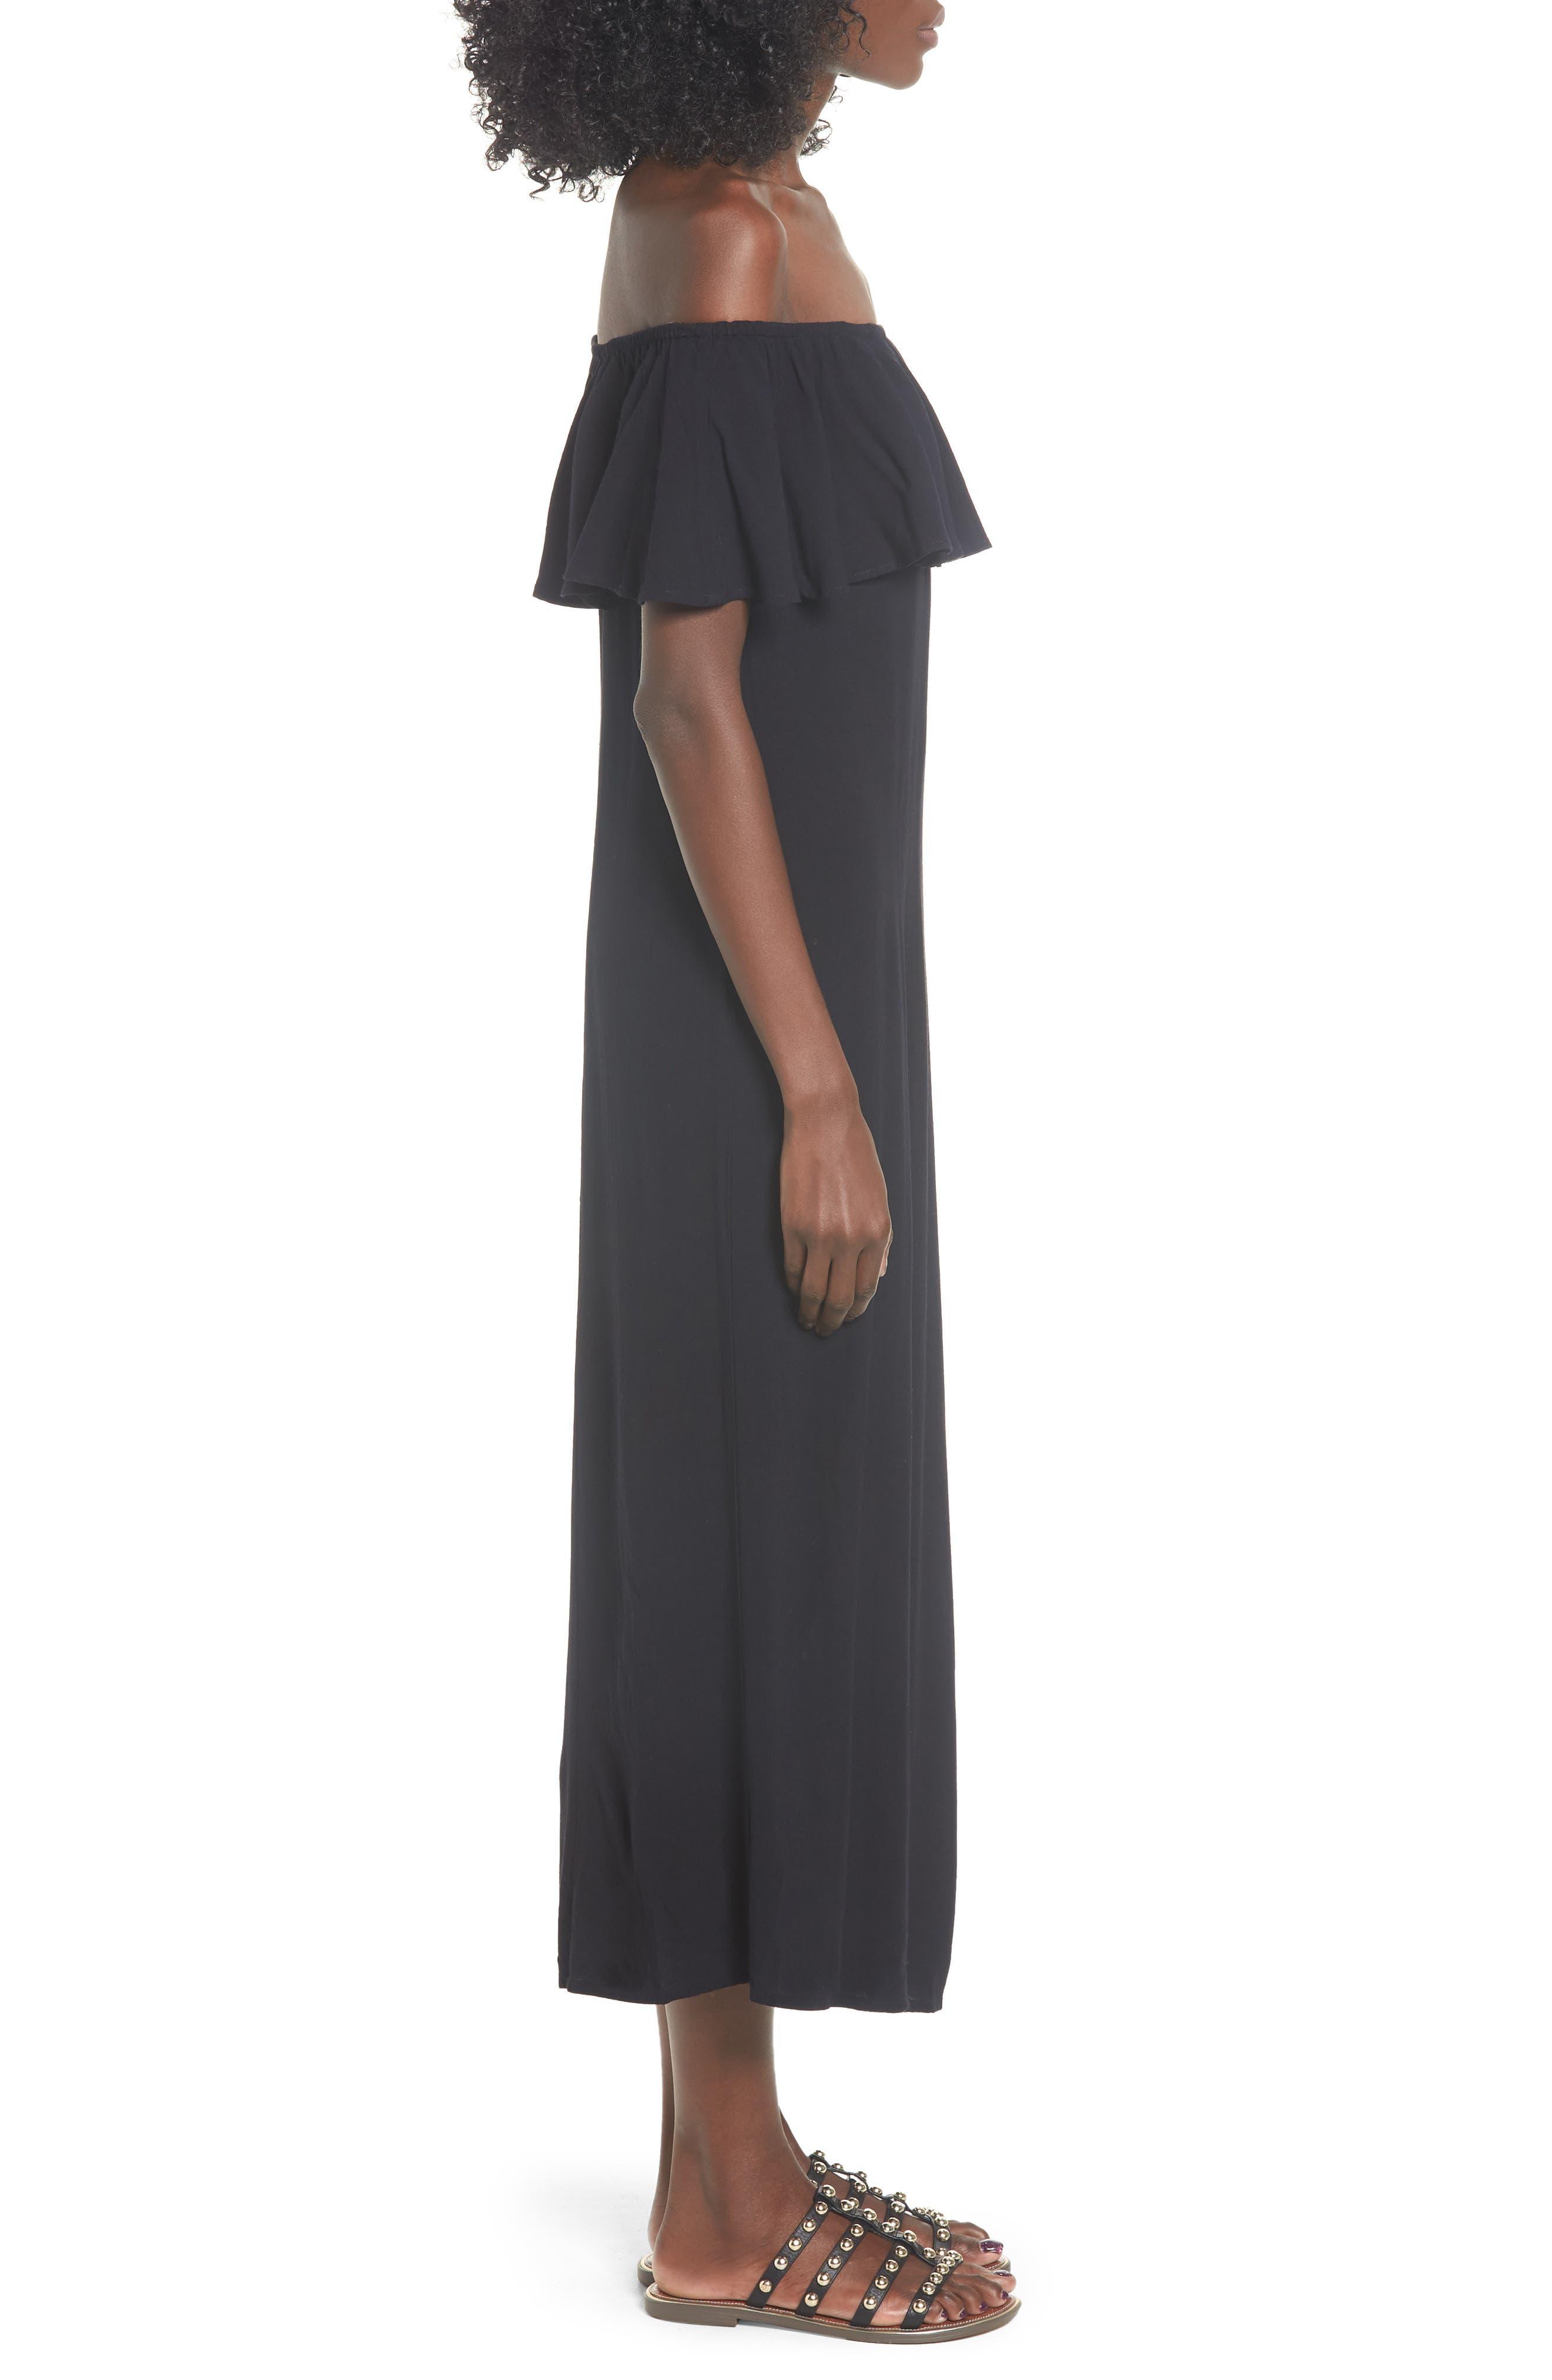 Vista Del Valle Off the Shoulder Ruffle Maxi Dress,                             Alternate thumbnail 3, color,                             001